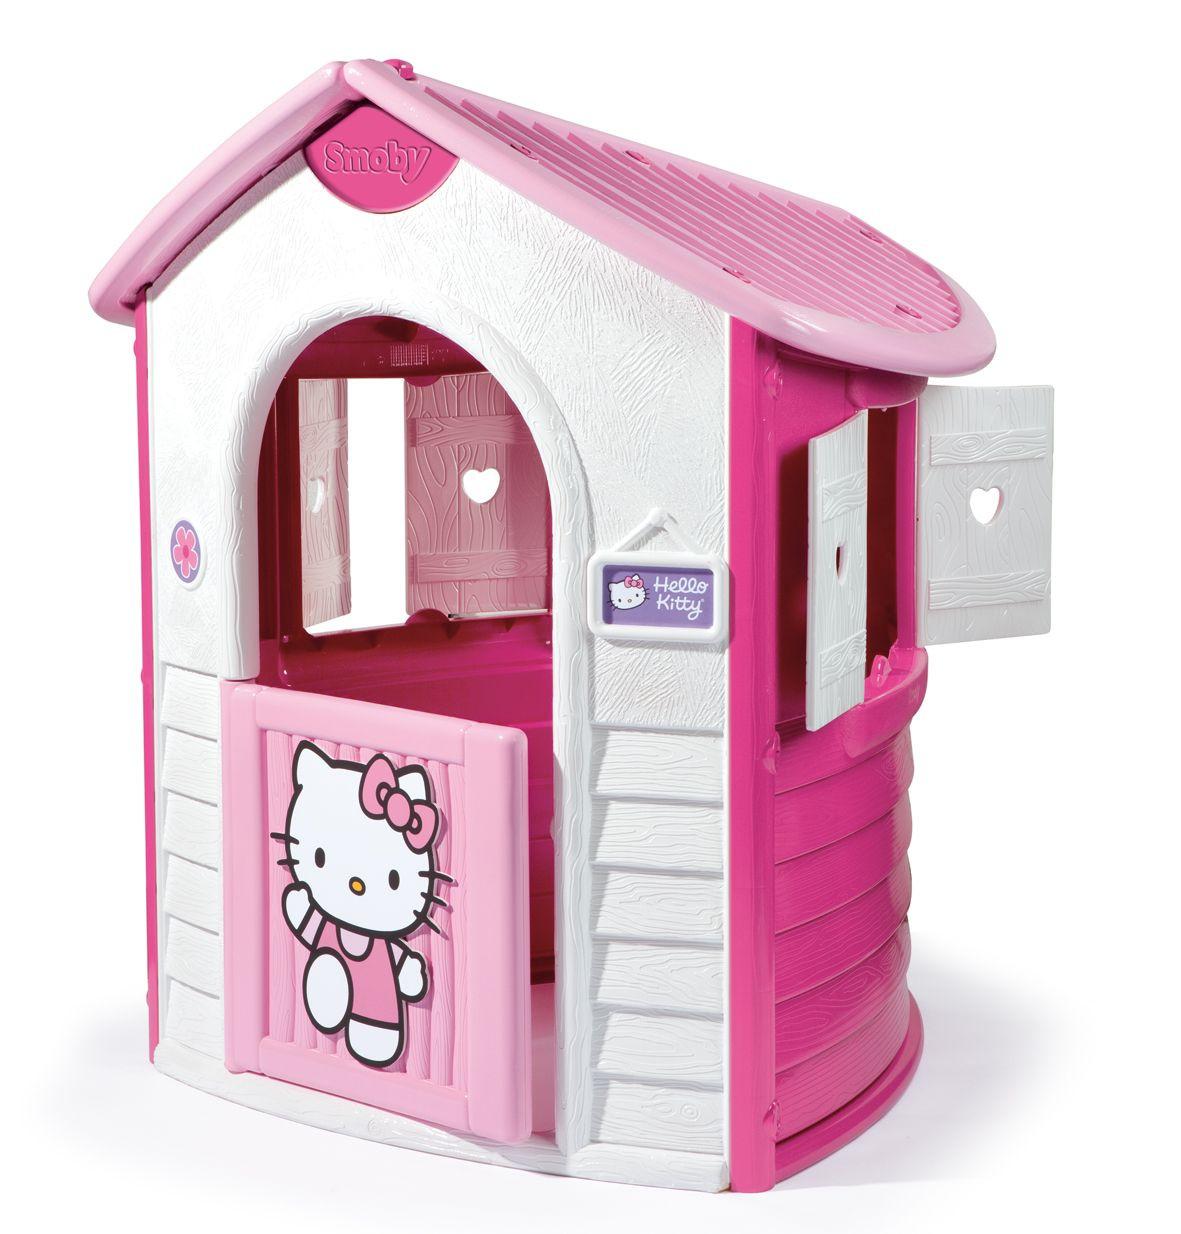 cabane de jardin hello kitty smoby avis. Black Bedroom Furniture Sets. Home Design Ideas